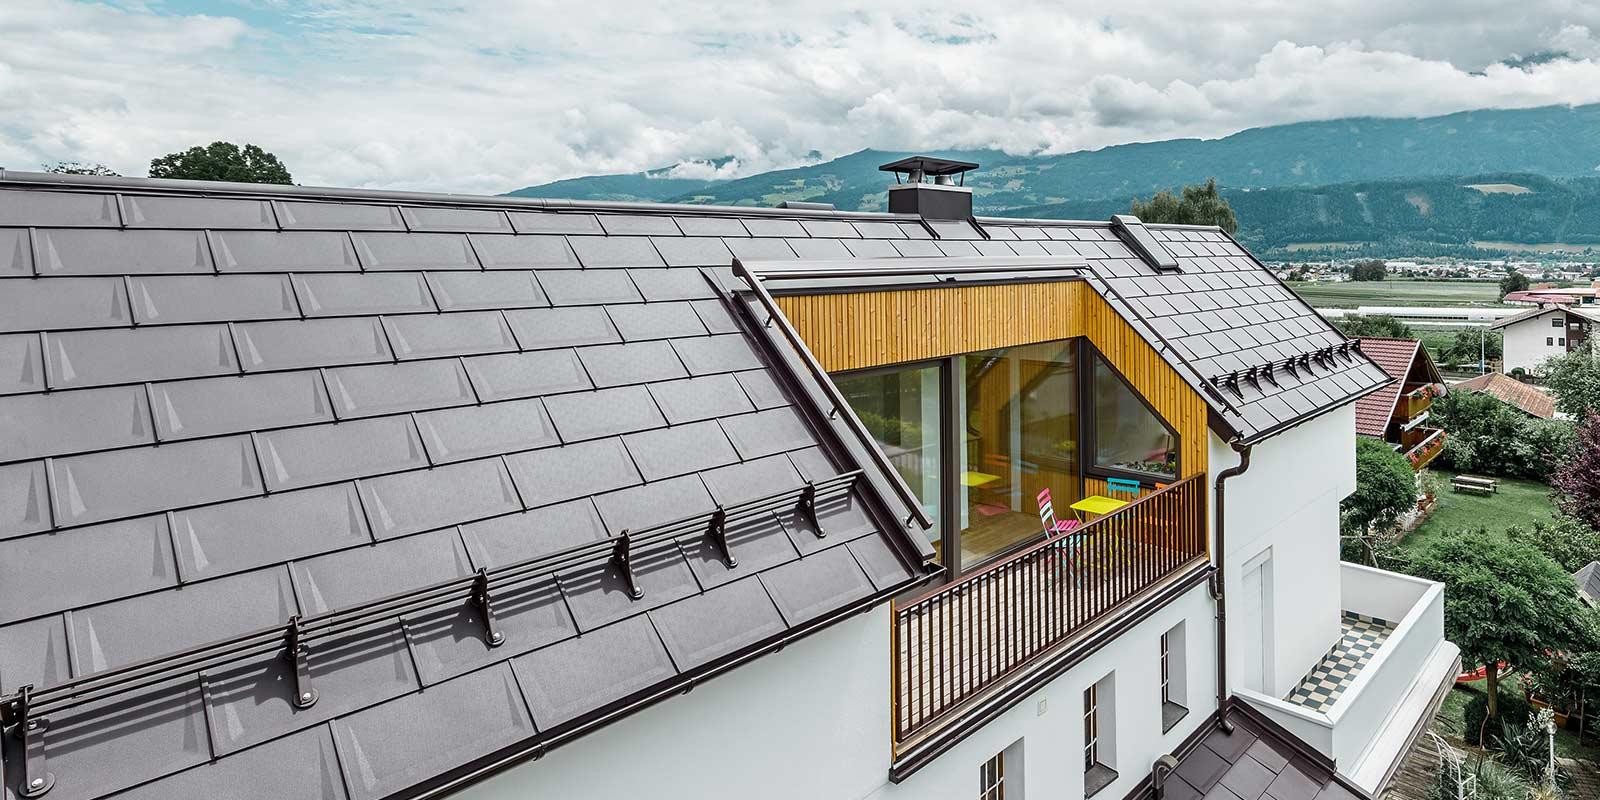 Top Dach- & Fassadensysteme aus Aluminium | PREFA UF84